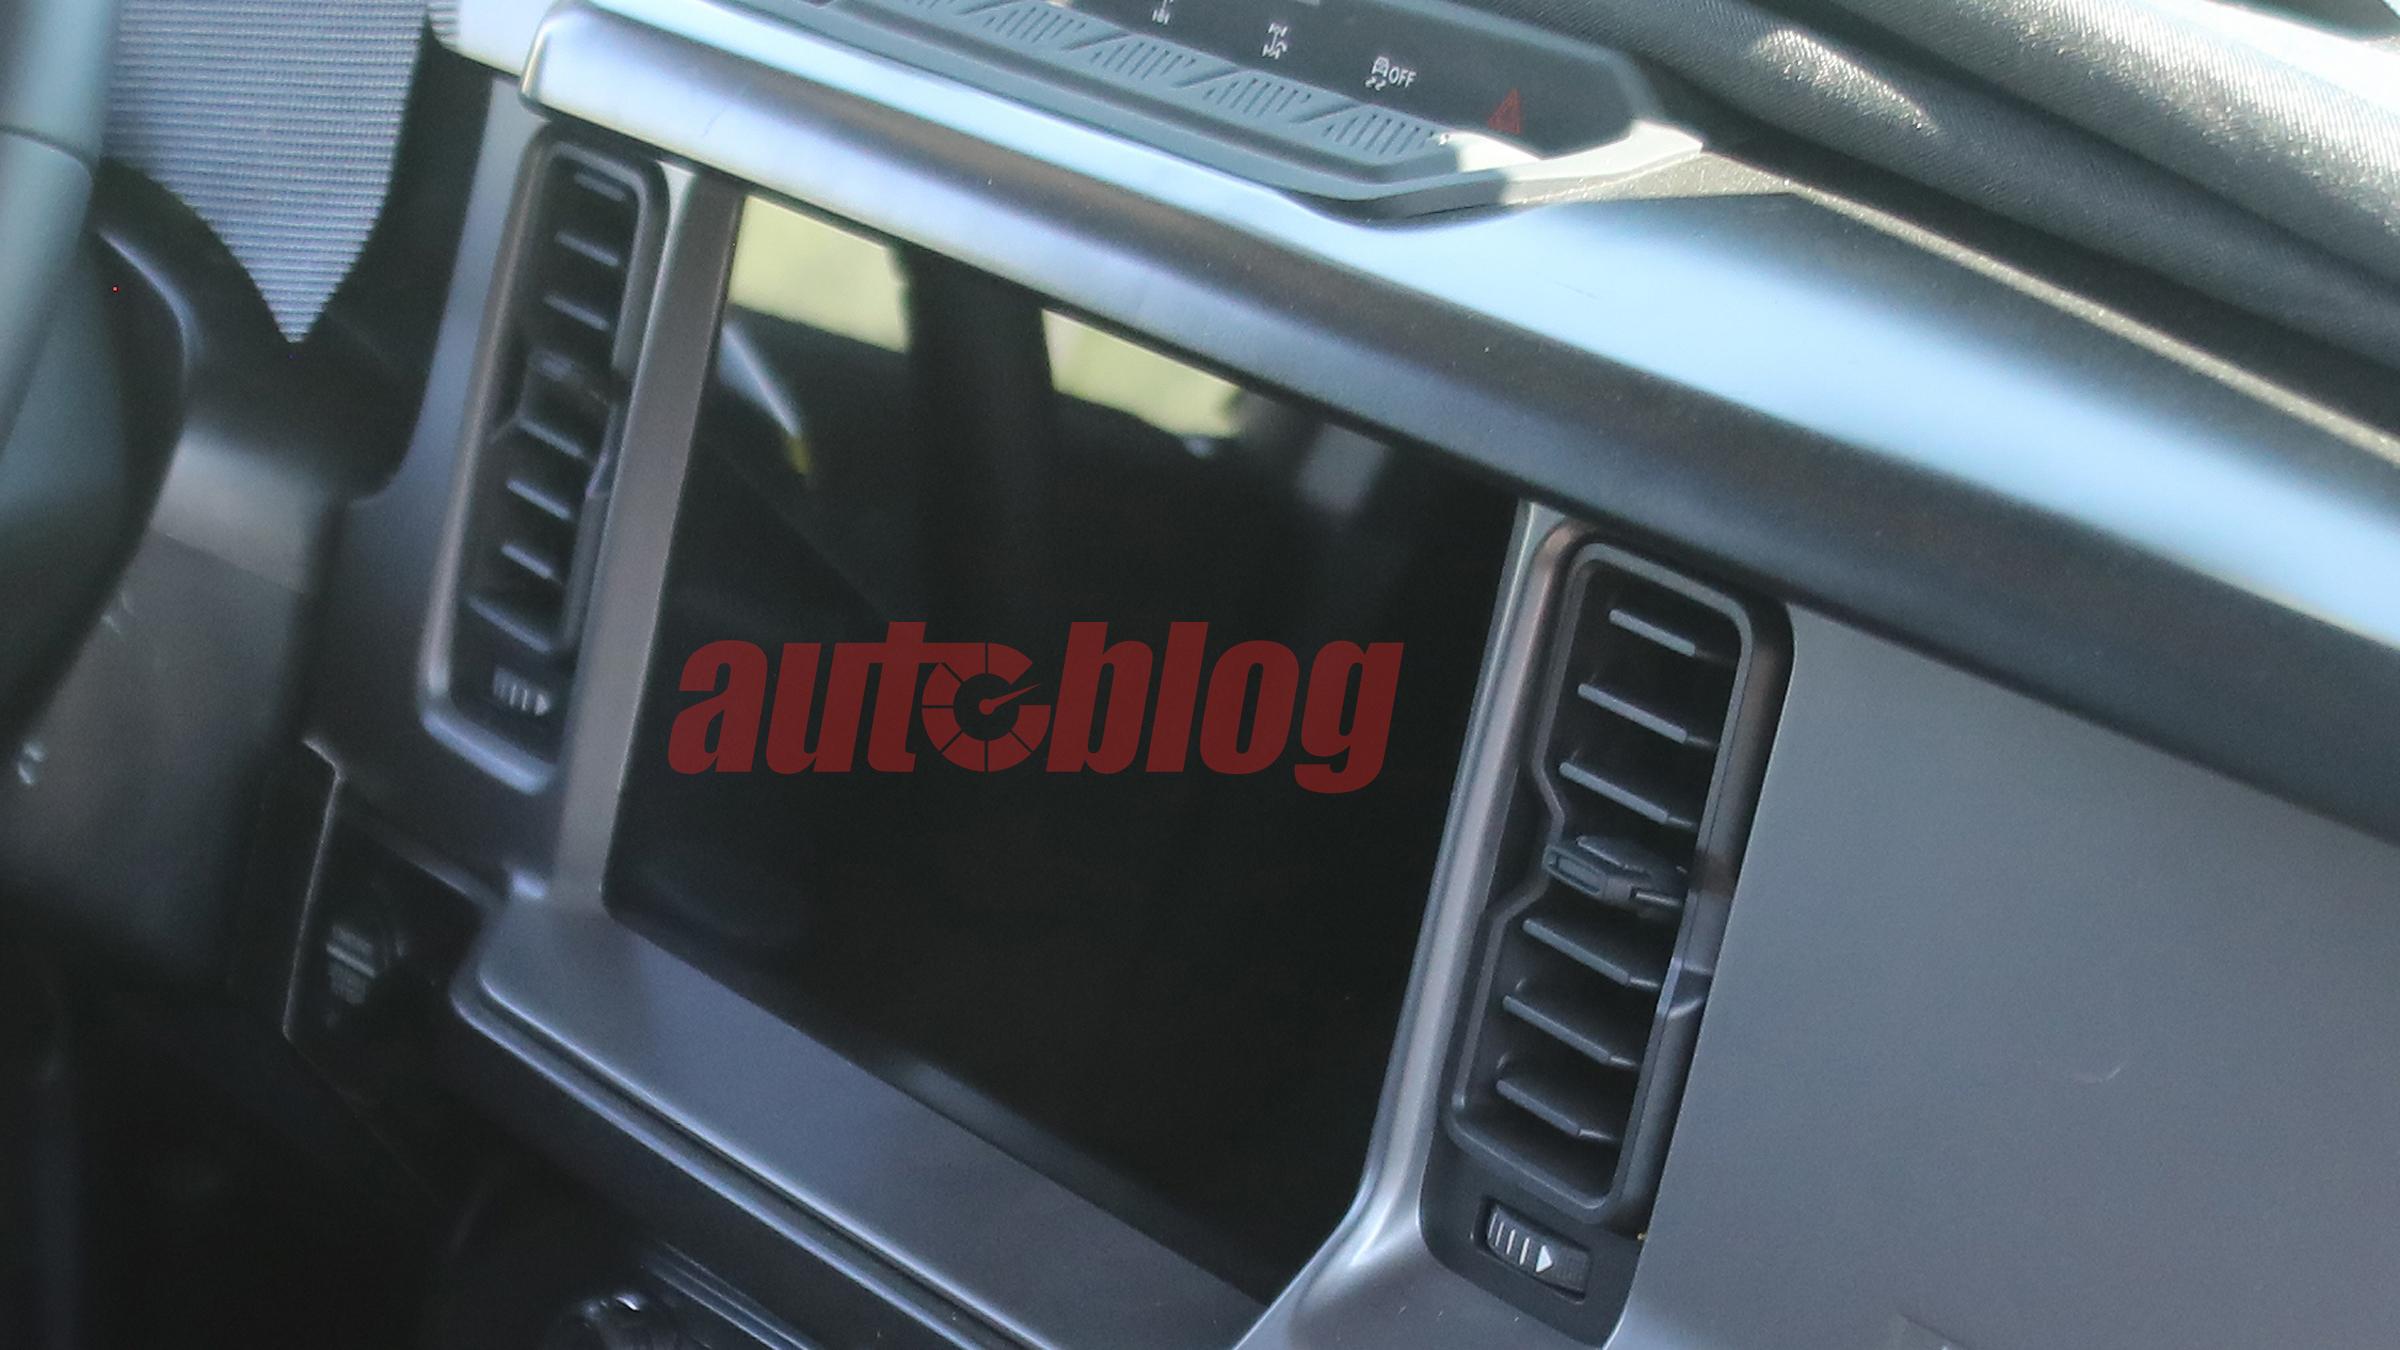 2021 Ford Bronco interior spy photo - Image Credit: Brian Williams